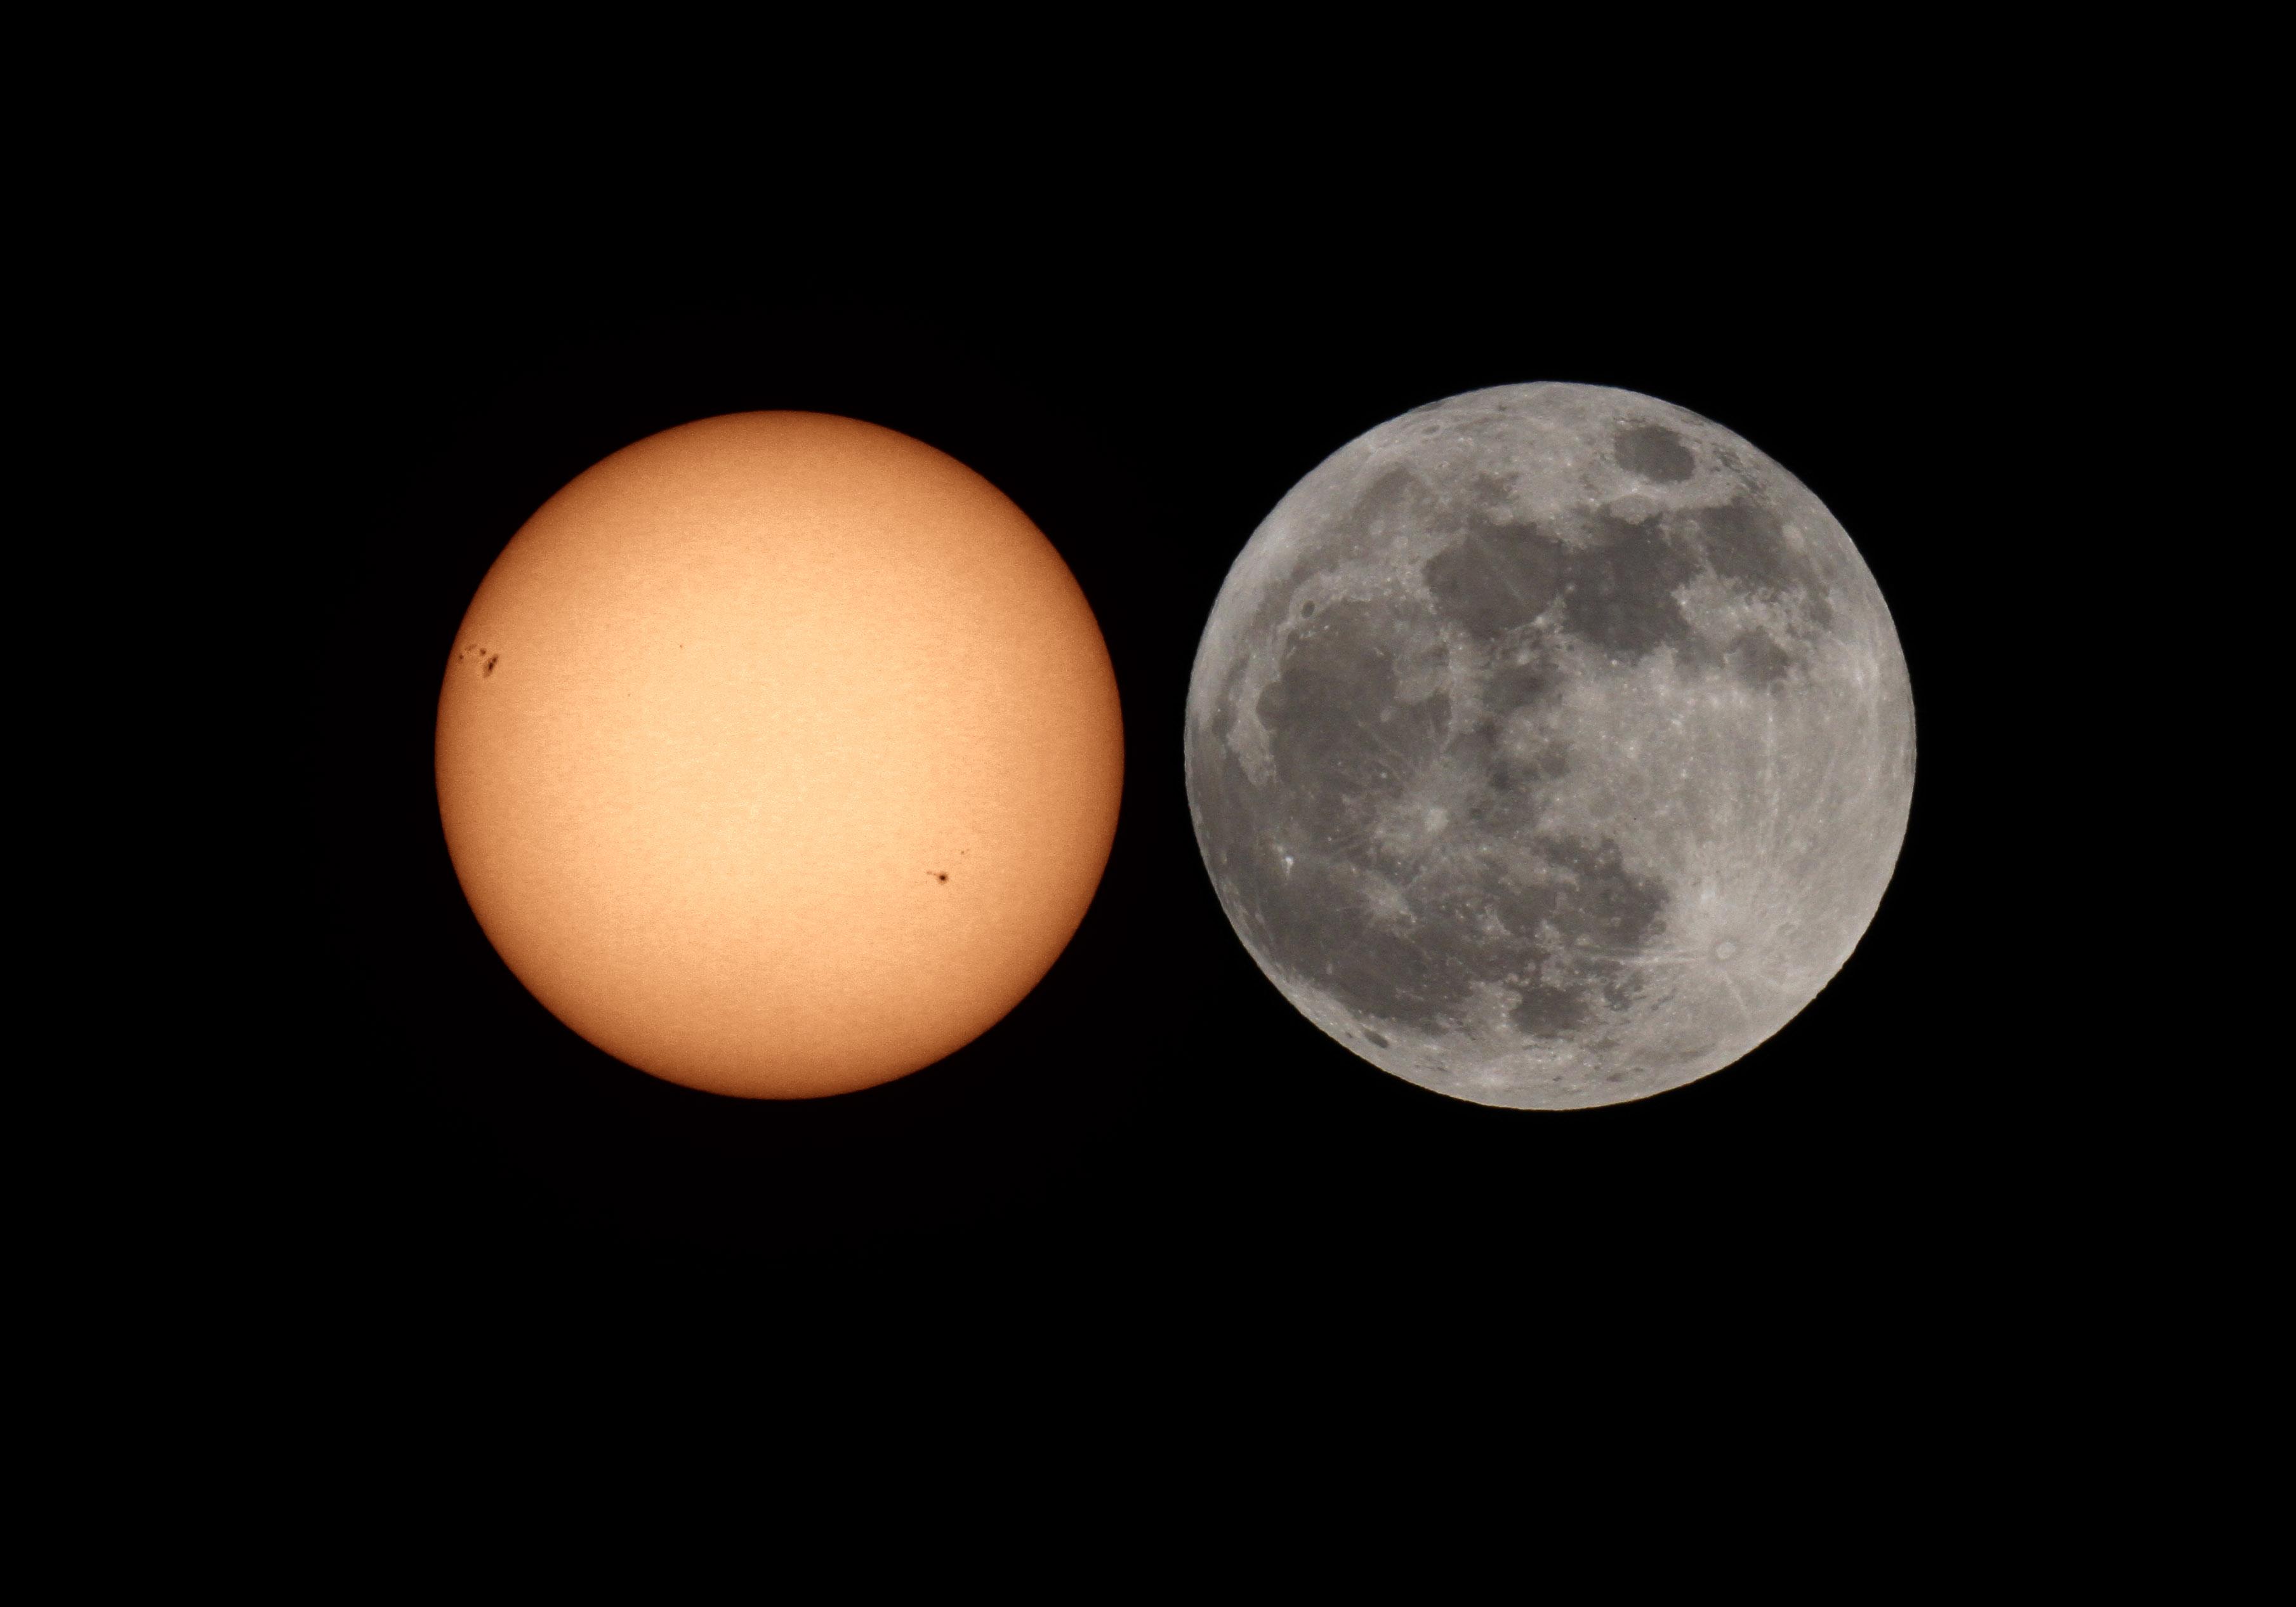 фото картинка изображение солнца и луны